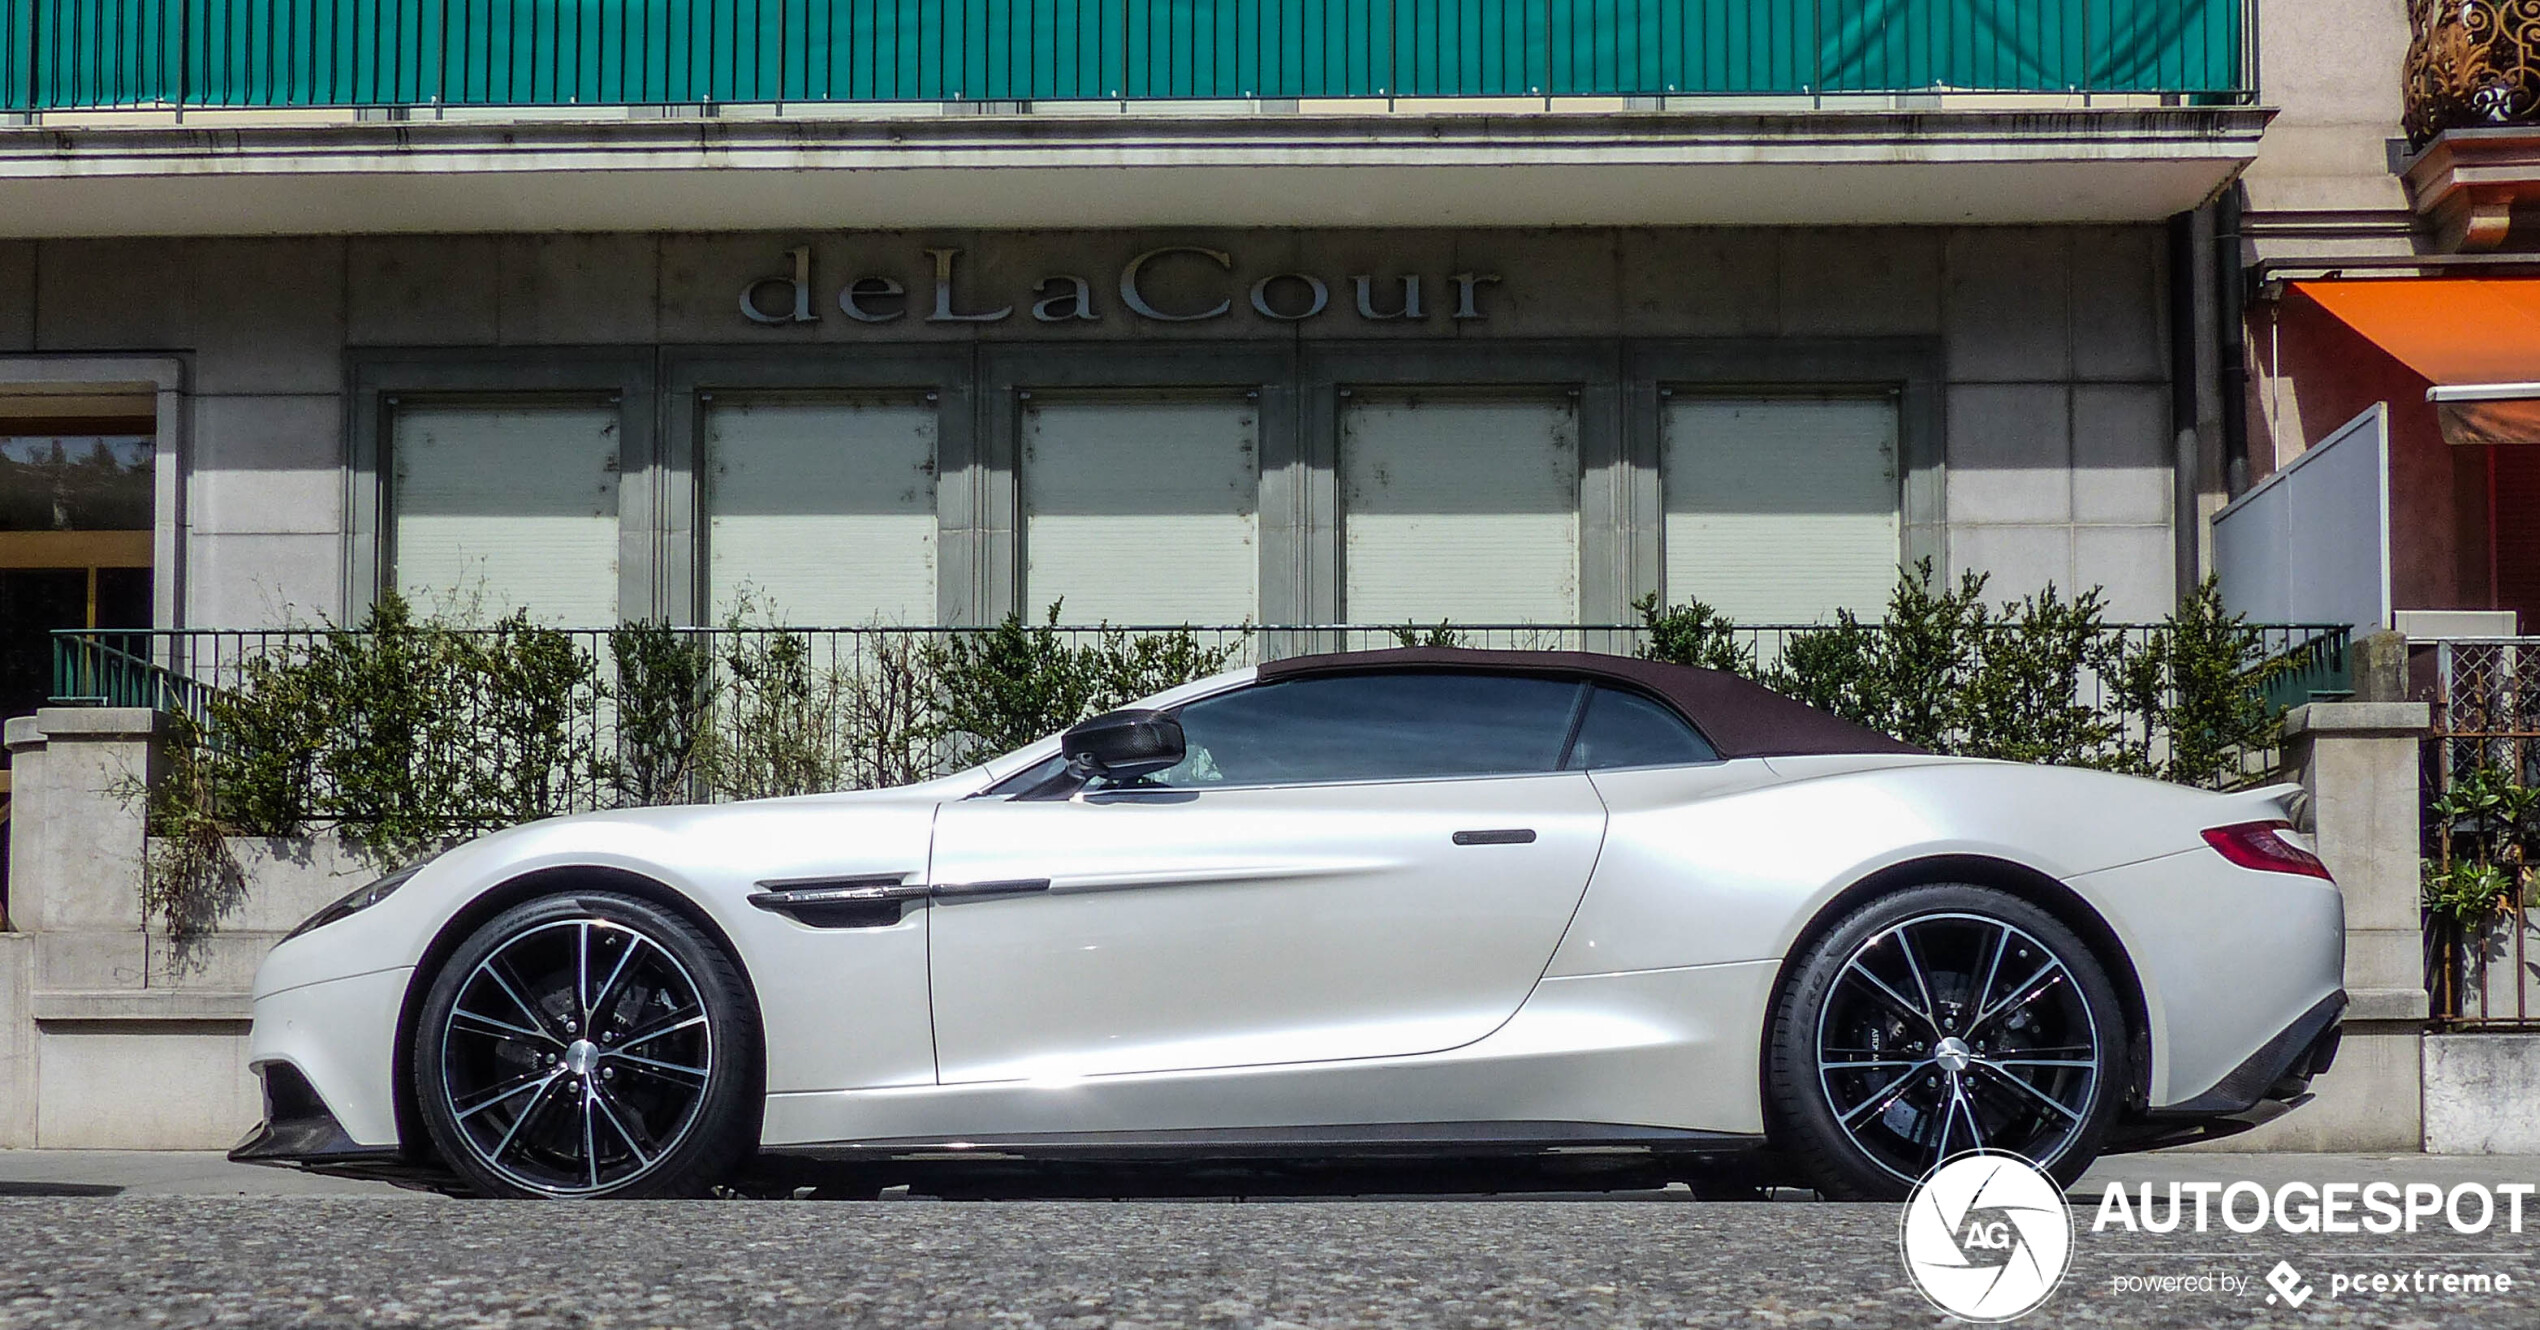 Aston Martin Vanquish Volante 10 February 2020 Autogespot